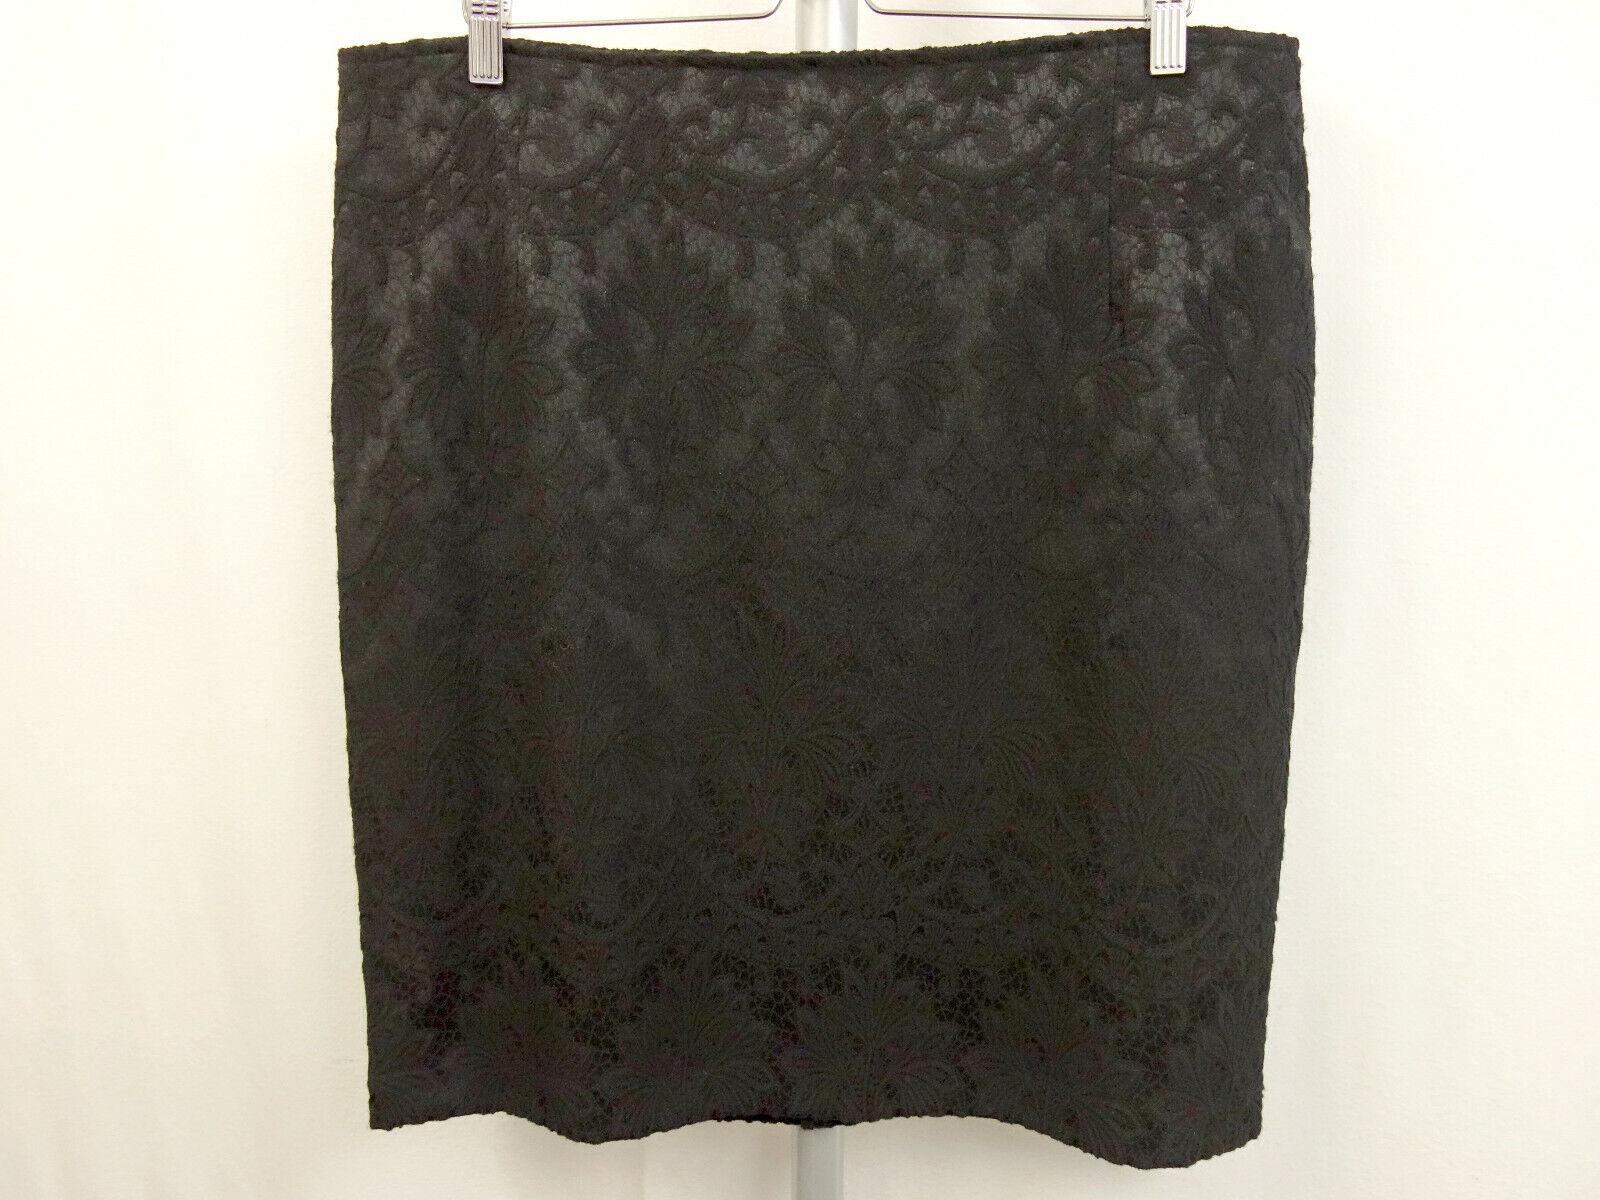 199 NEW Sem Per Lei Skirt Size 44 Skirt Pattern in Lace-Look Black